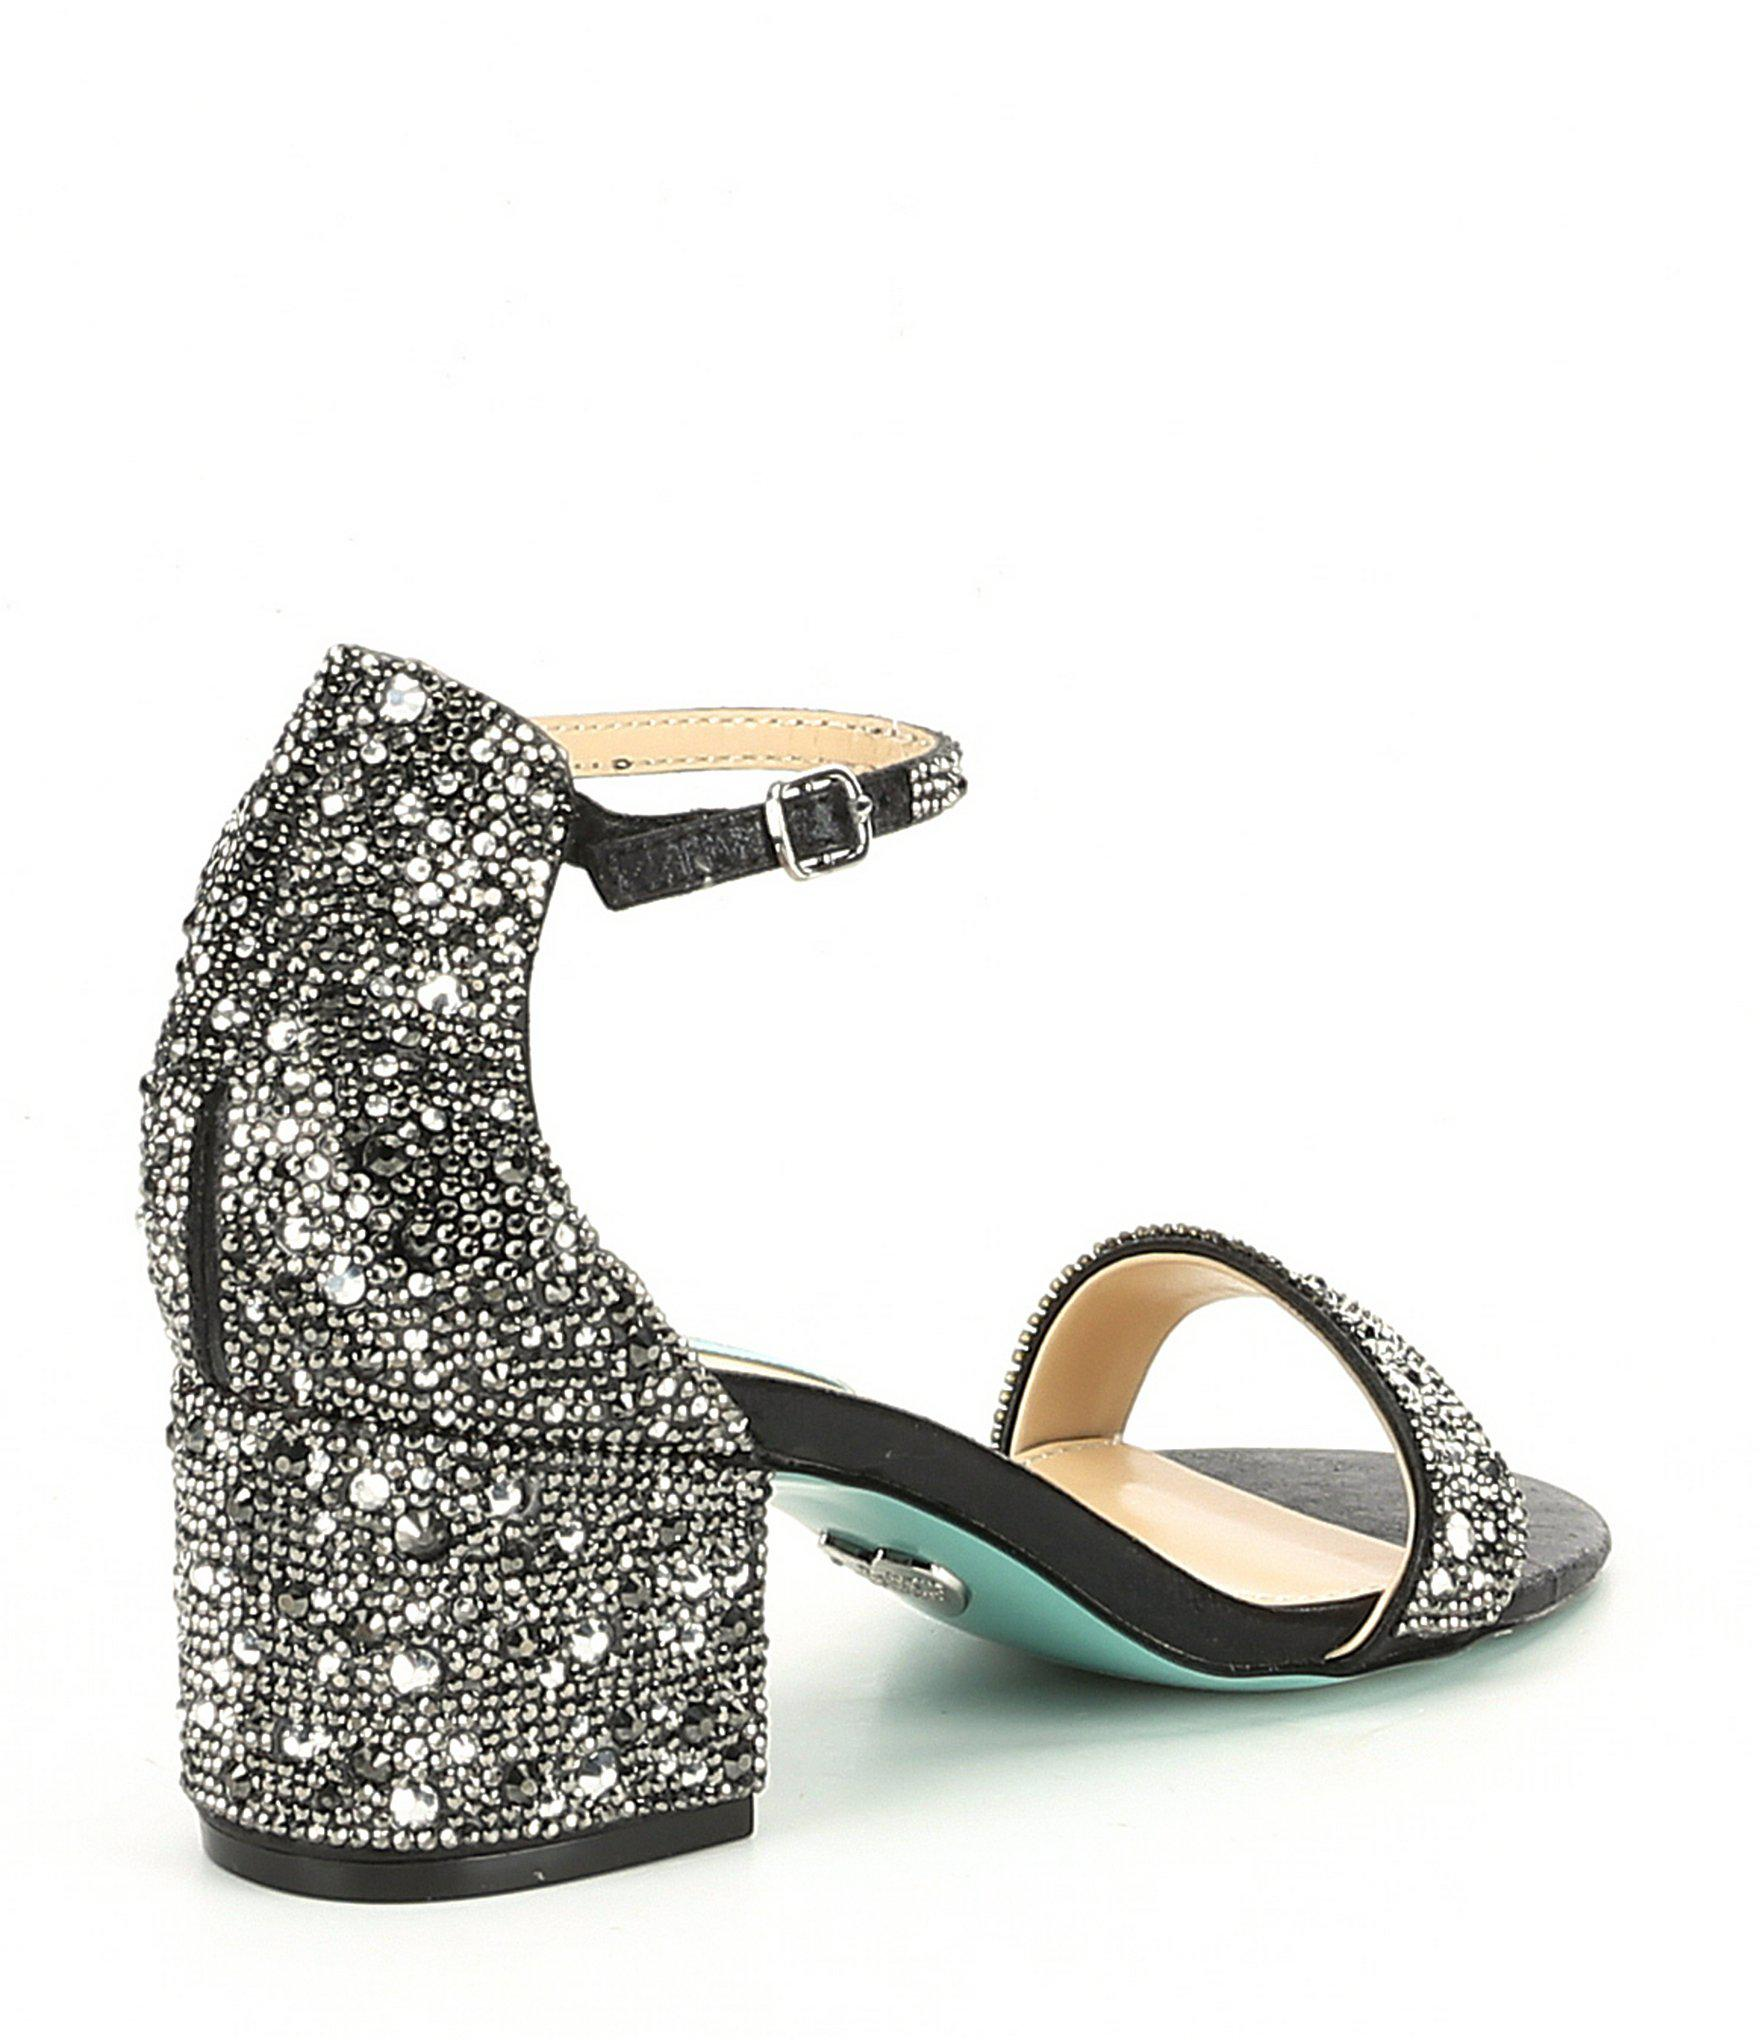 904724d4fe7 Lyst - Betsey Johnson Blue By Mari Block Heel Dress Sandals in Black